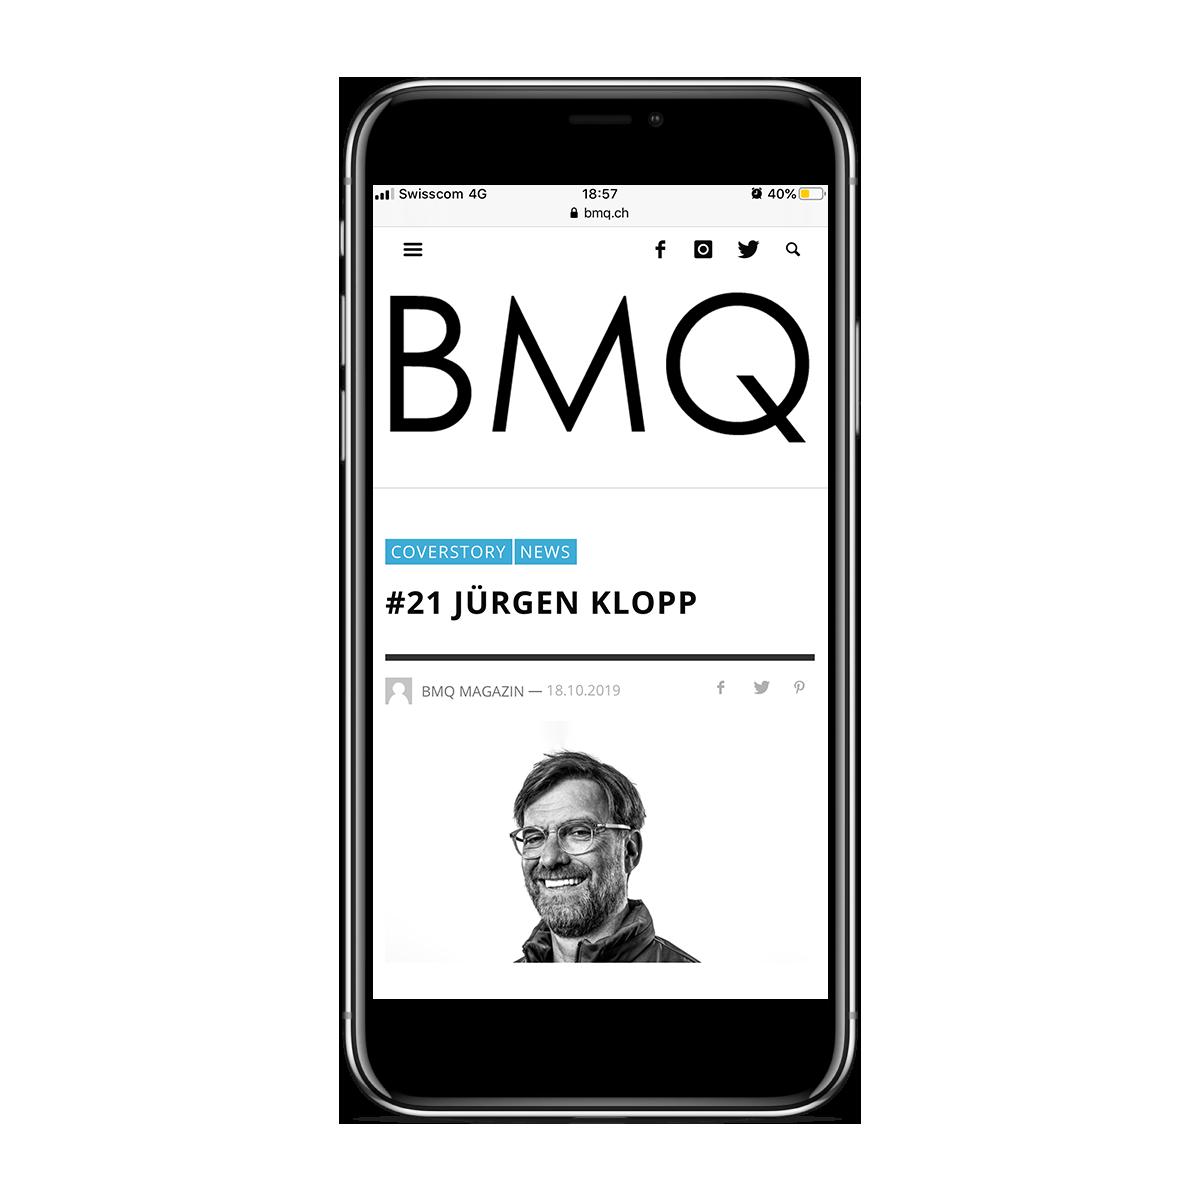 BMQ - Responsive Design